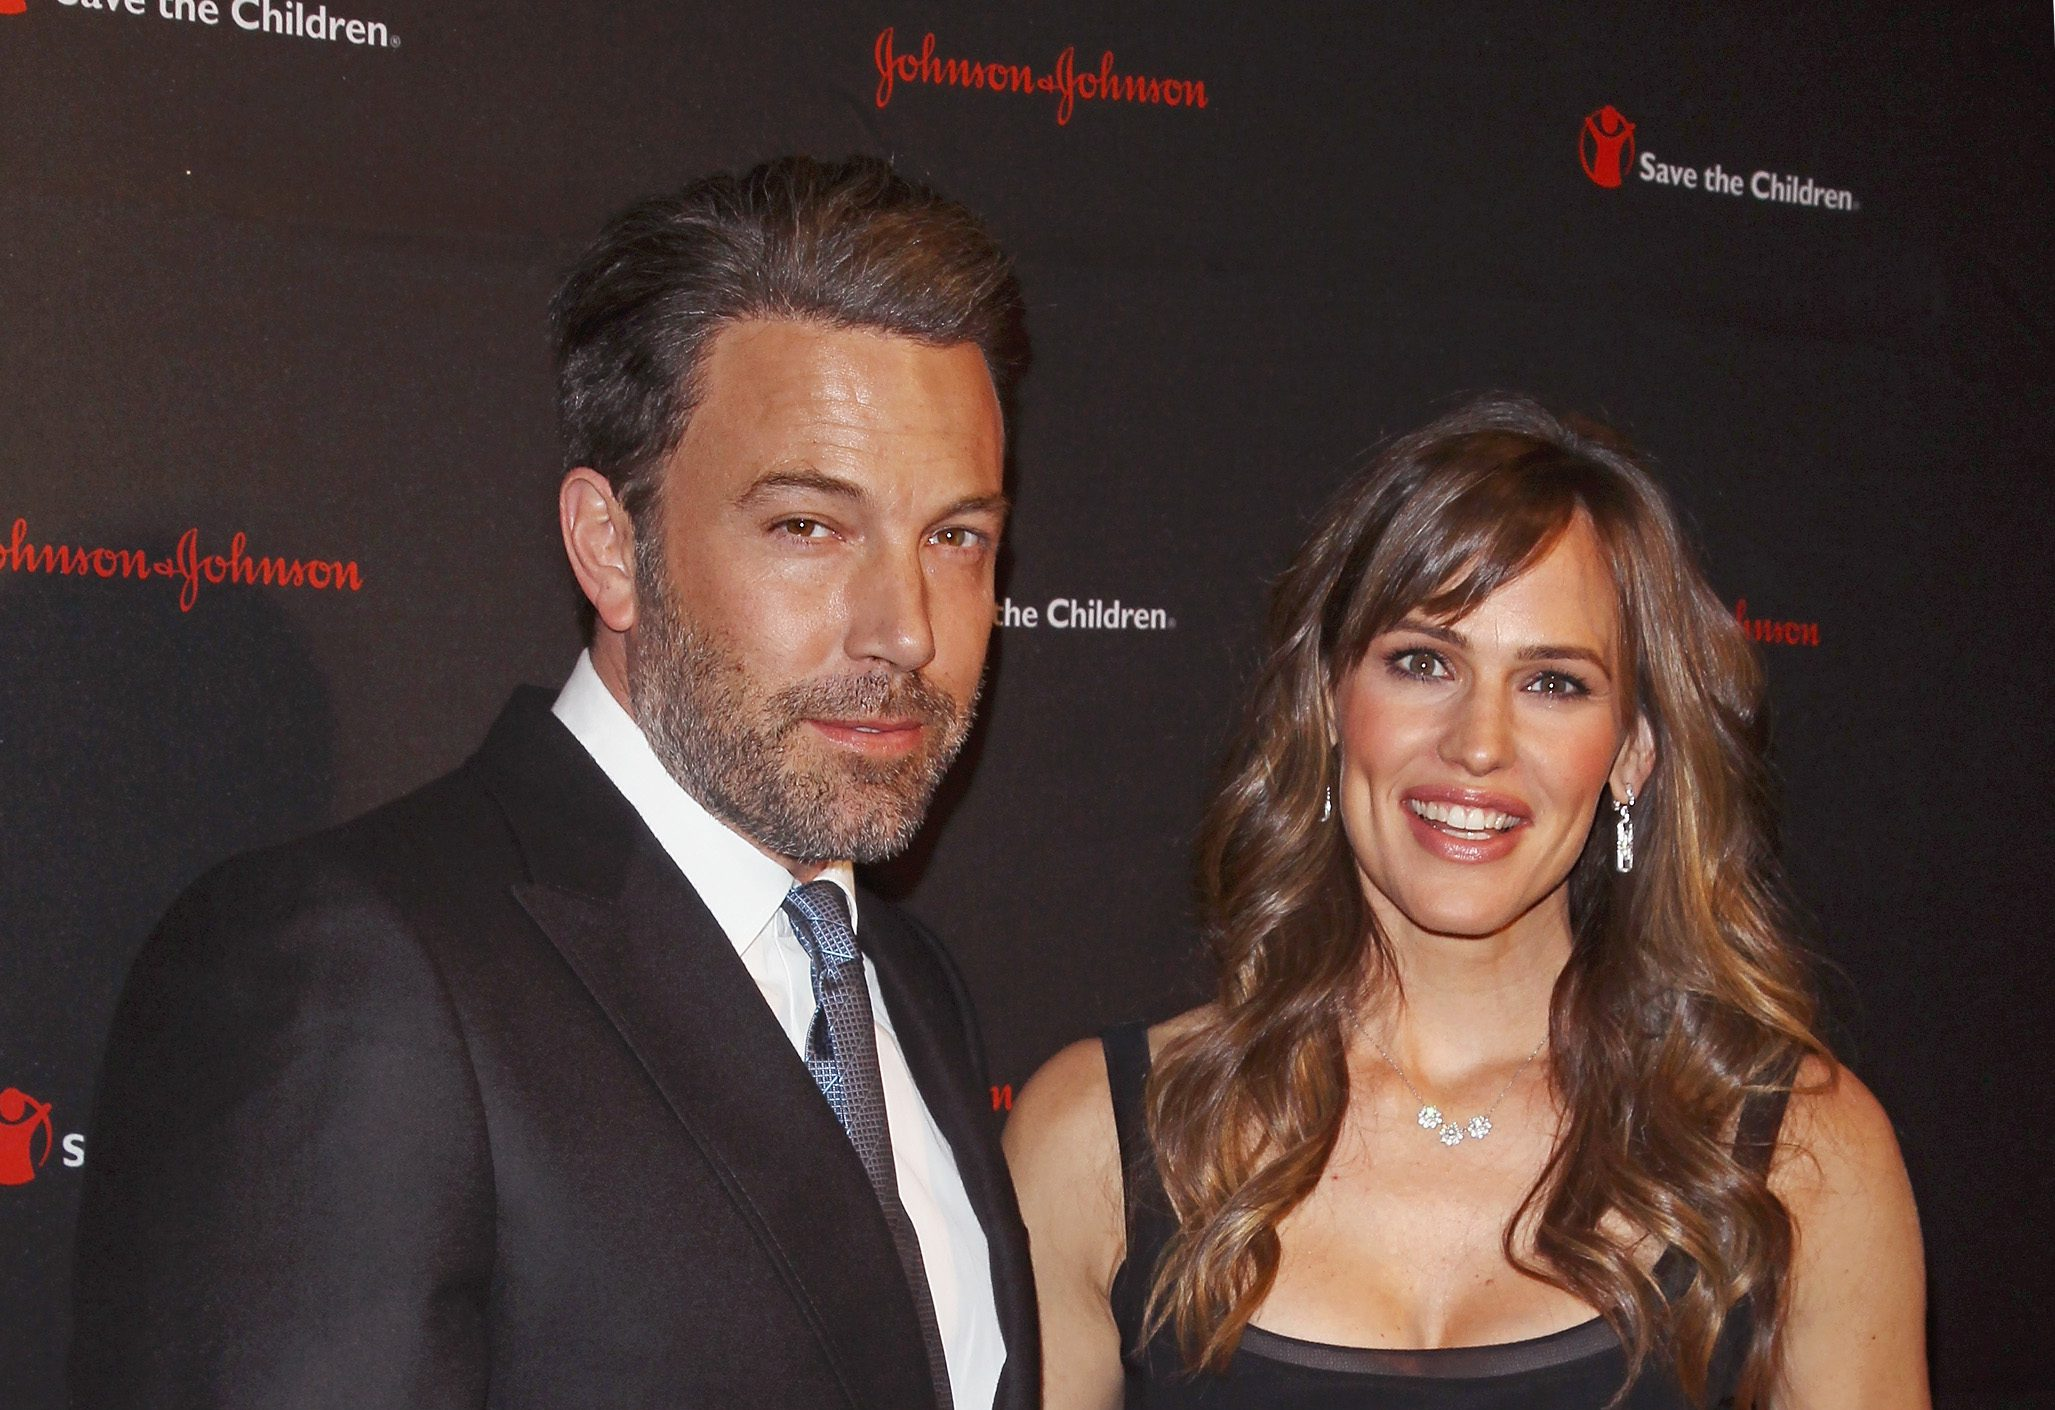 Ben Affleck and Jennifer Garner file for 'amicable' divorce two years after announcing split